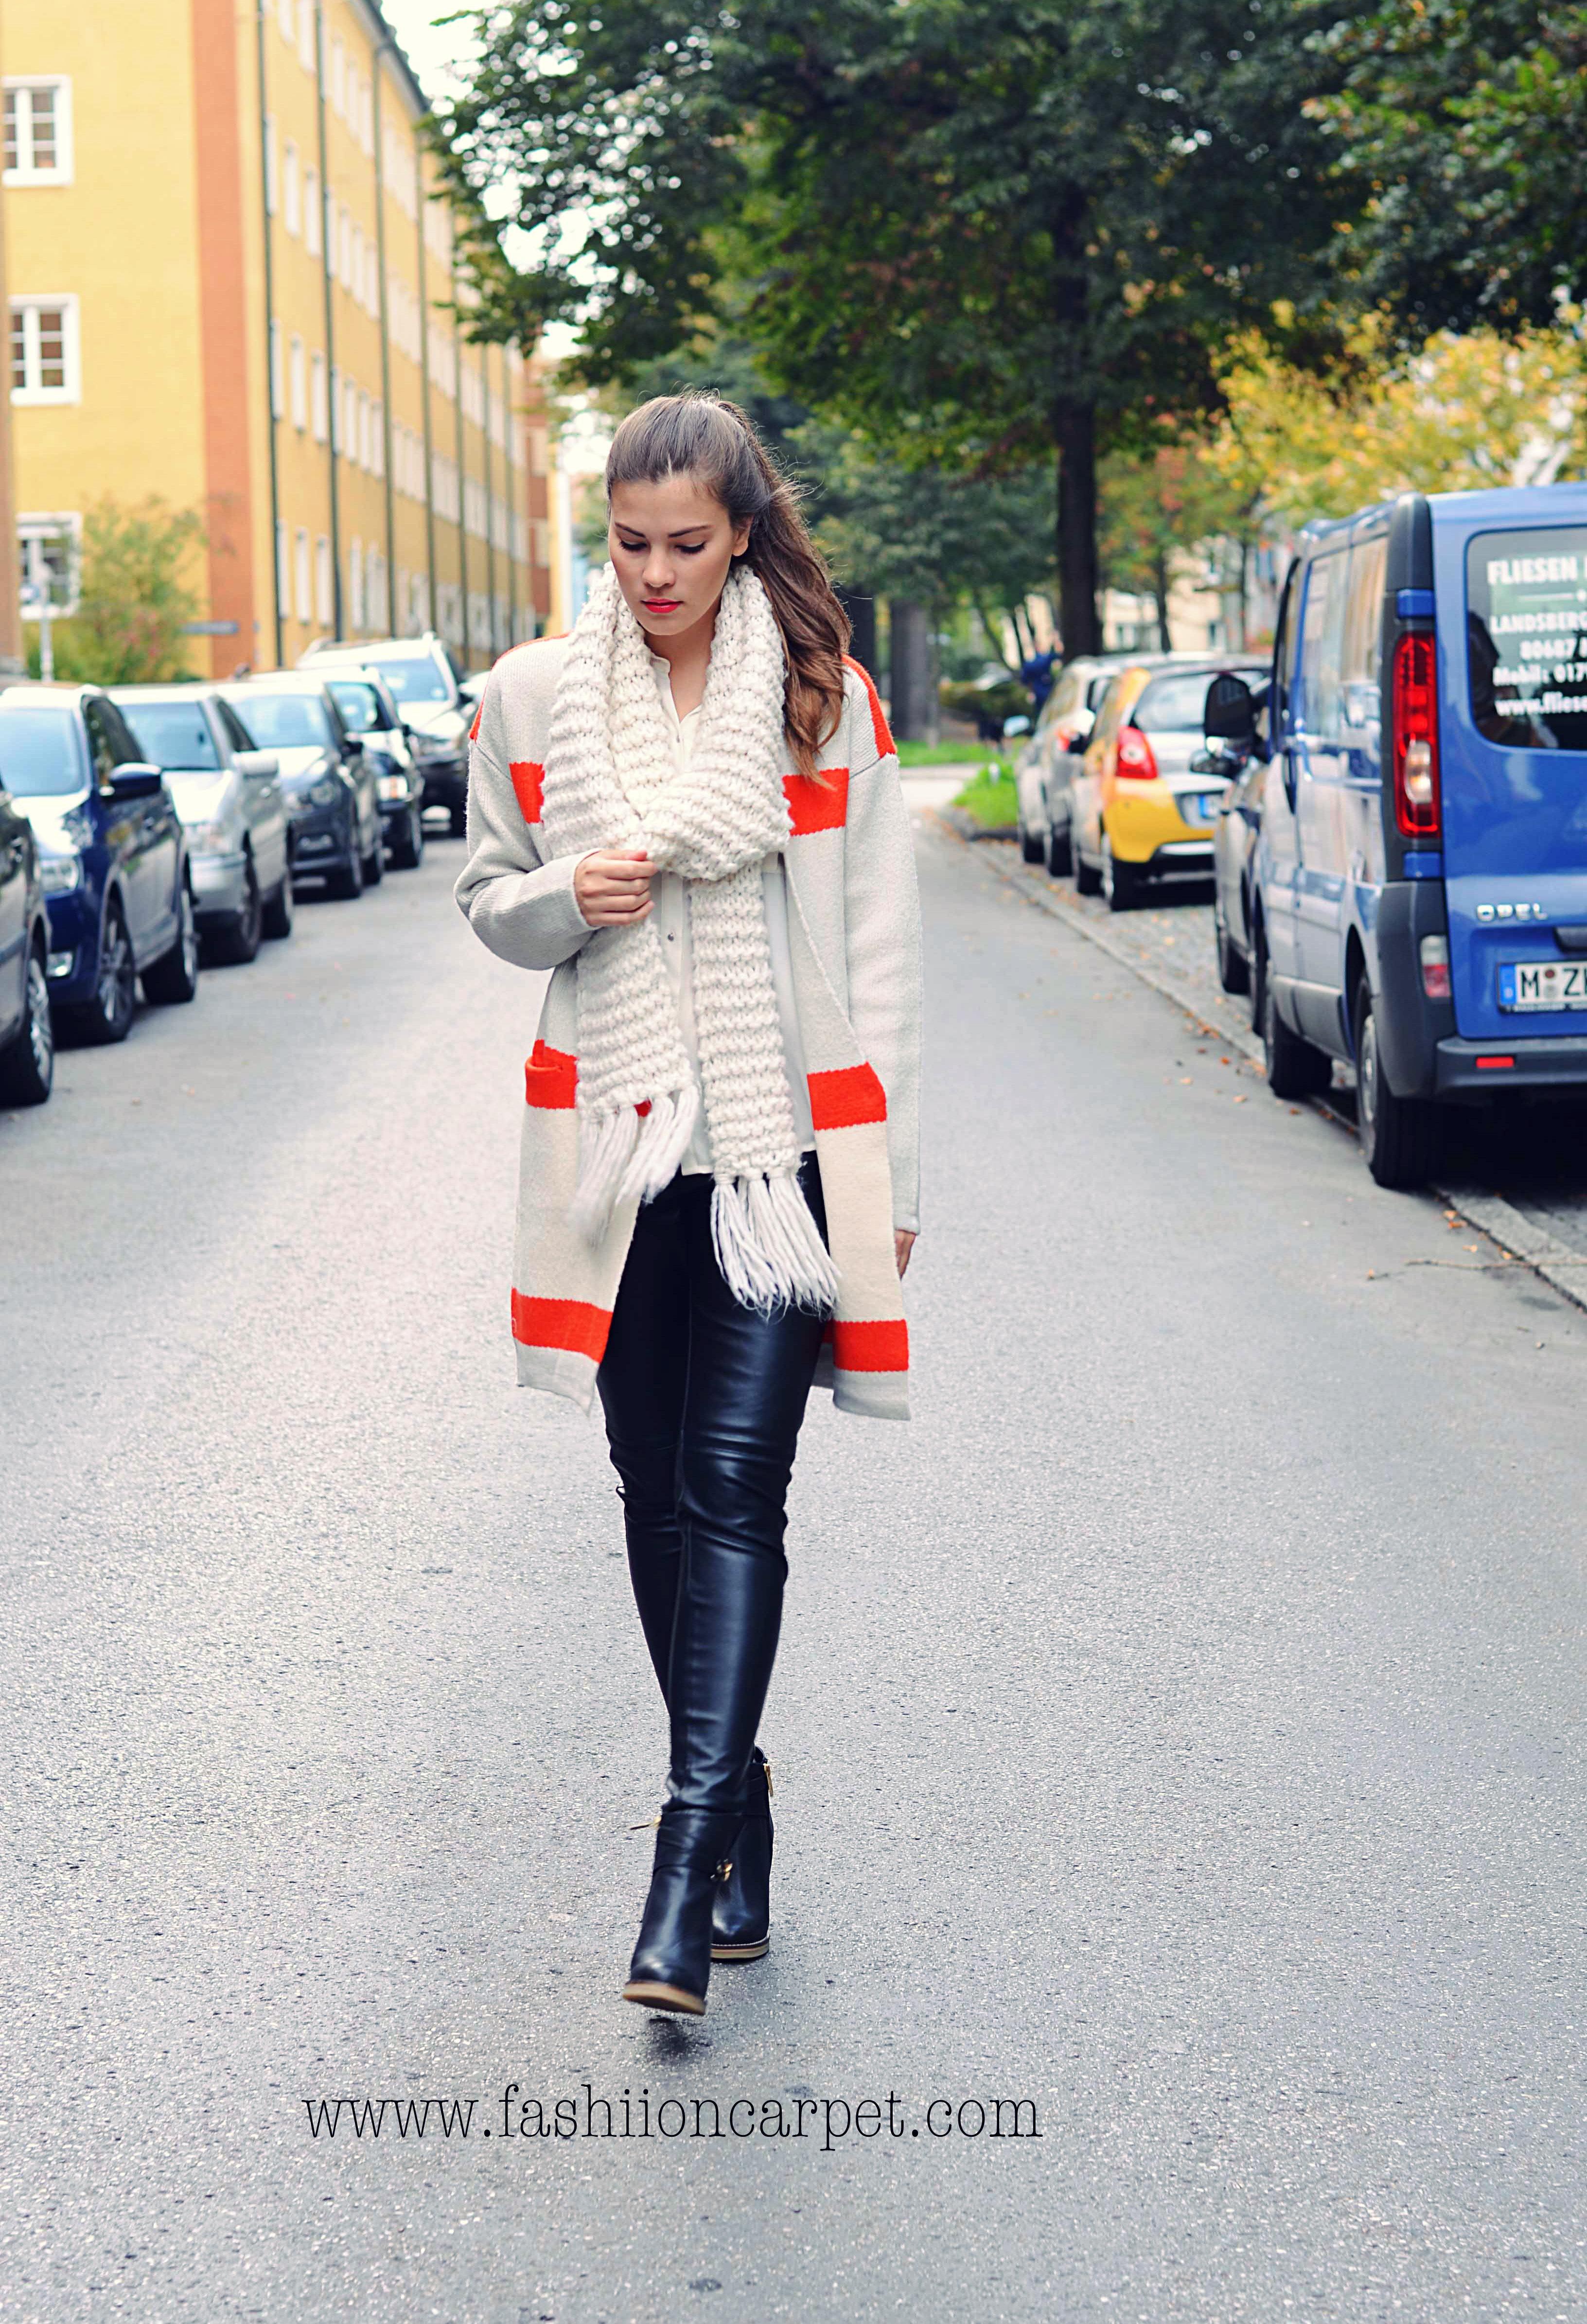 Fashionbloggermünchen-fashionblogger-blogger-fashionblog-münchen-munich-fashion-outfit-mode-style-streetstyle-bloggerstreetstyle-fashiioncarpet-fashiioncarpet-look-ootd-fashionblogdeutschland-deutscherfashionblogger-fashionbloggergermany-germanblogger-shoppingqueen-shoppingqueenblogger-shoppingqueenfashionblogger-shoppingqueenfashionbloggermünchen-vilacardigan-vilacardiganvipintaknit-vilacardiganvampor-cardigan-duoboots